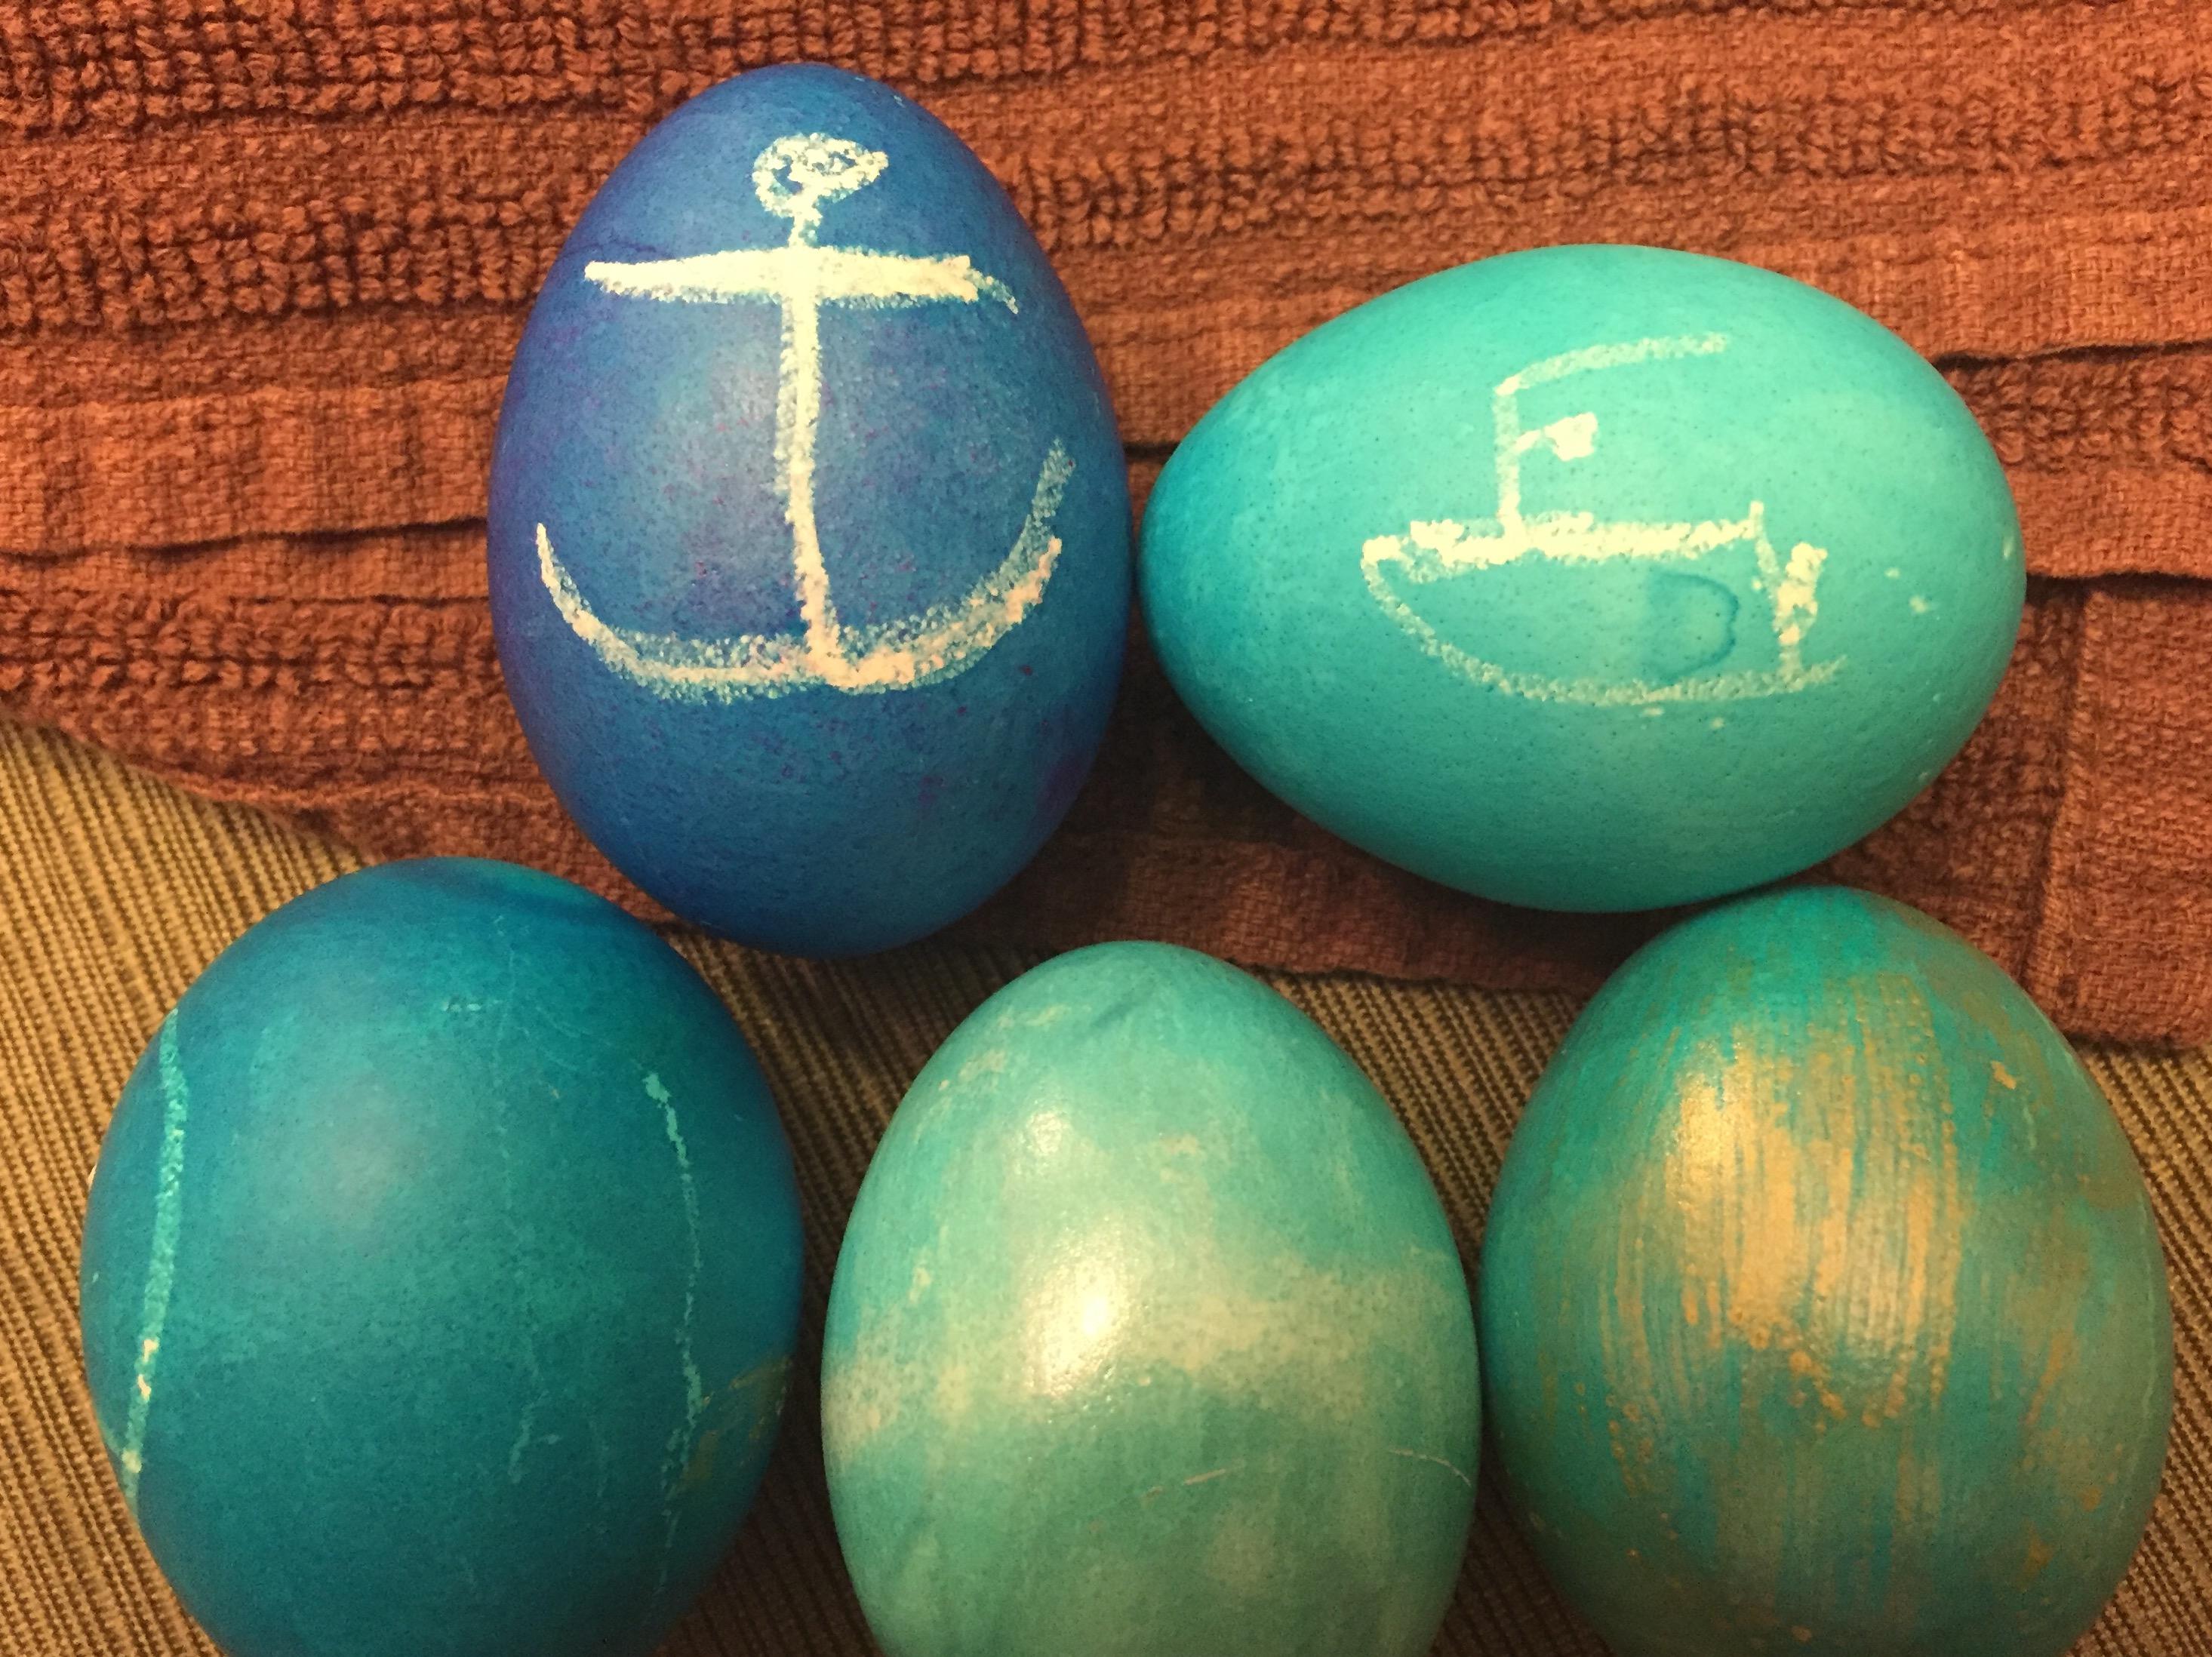 Nautical Easter eggs. (Photo: Daniel Nee)